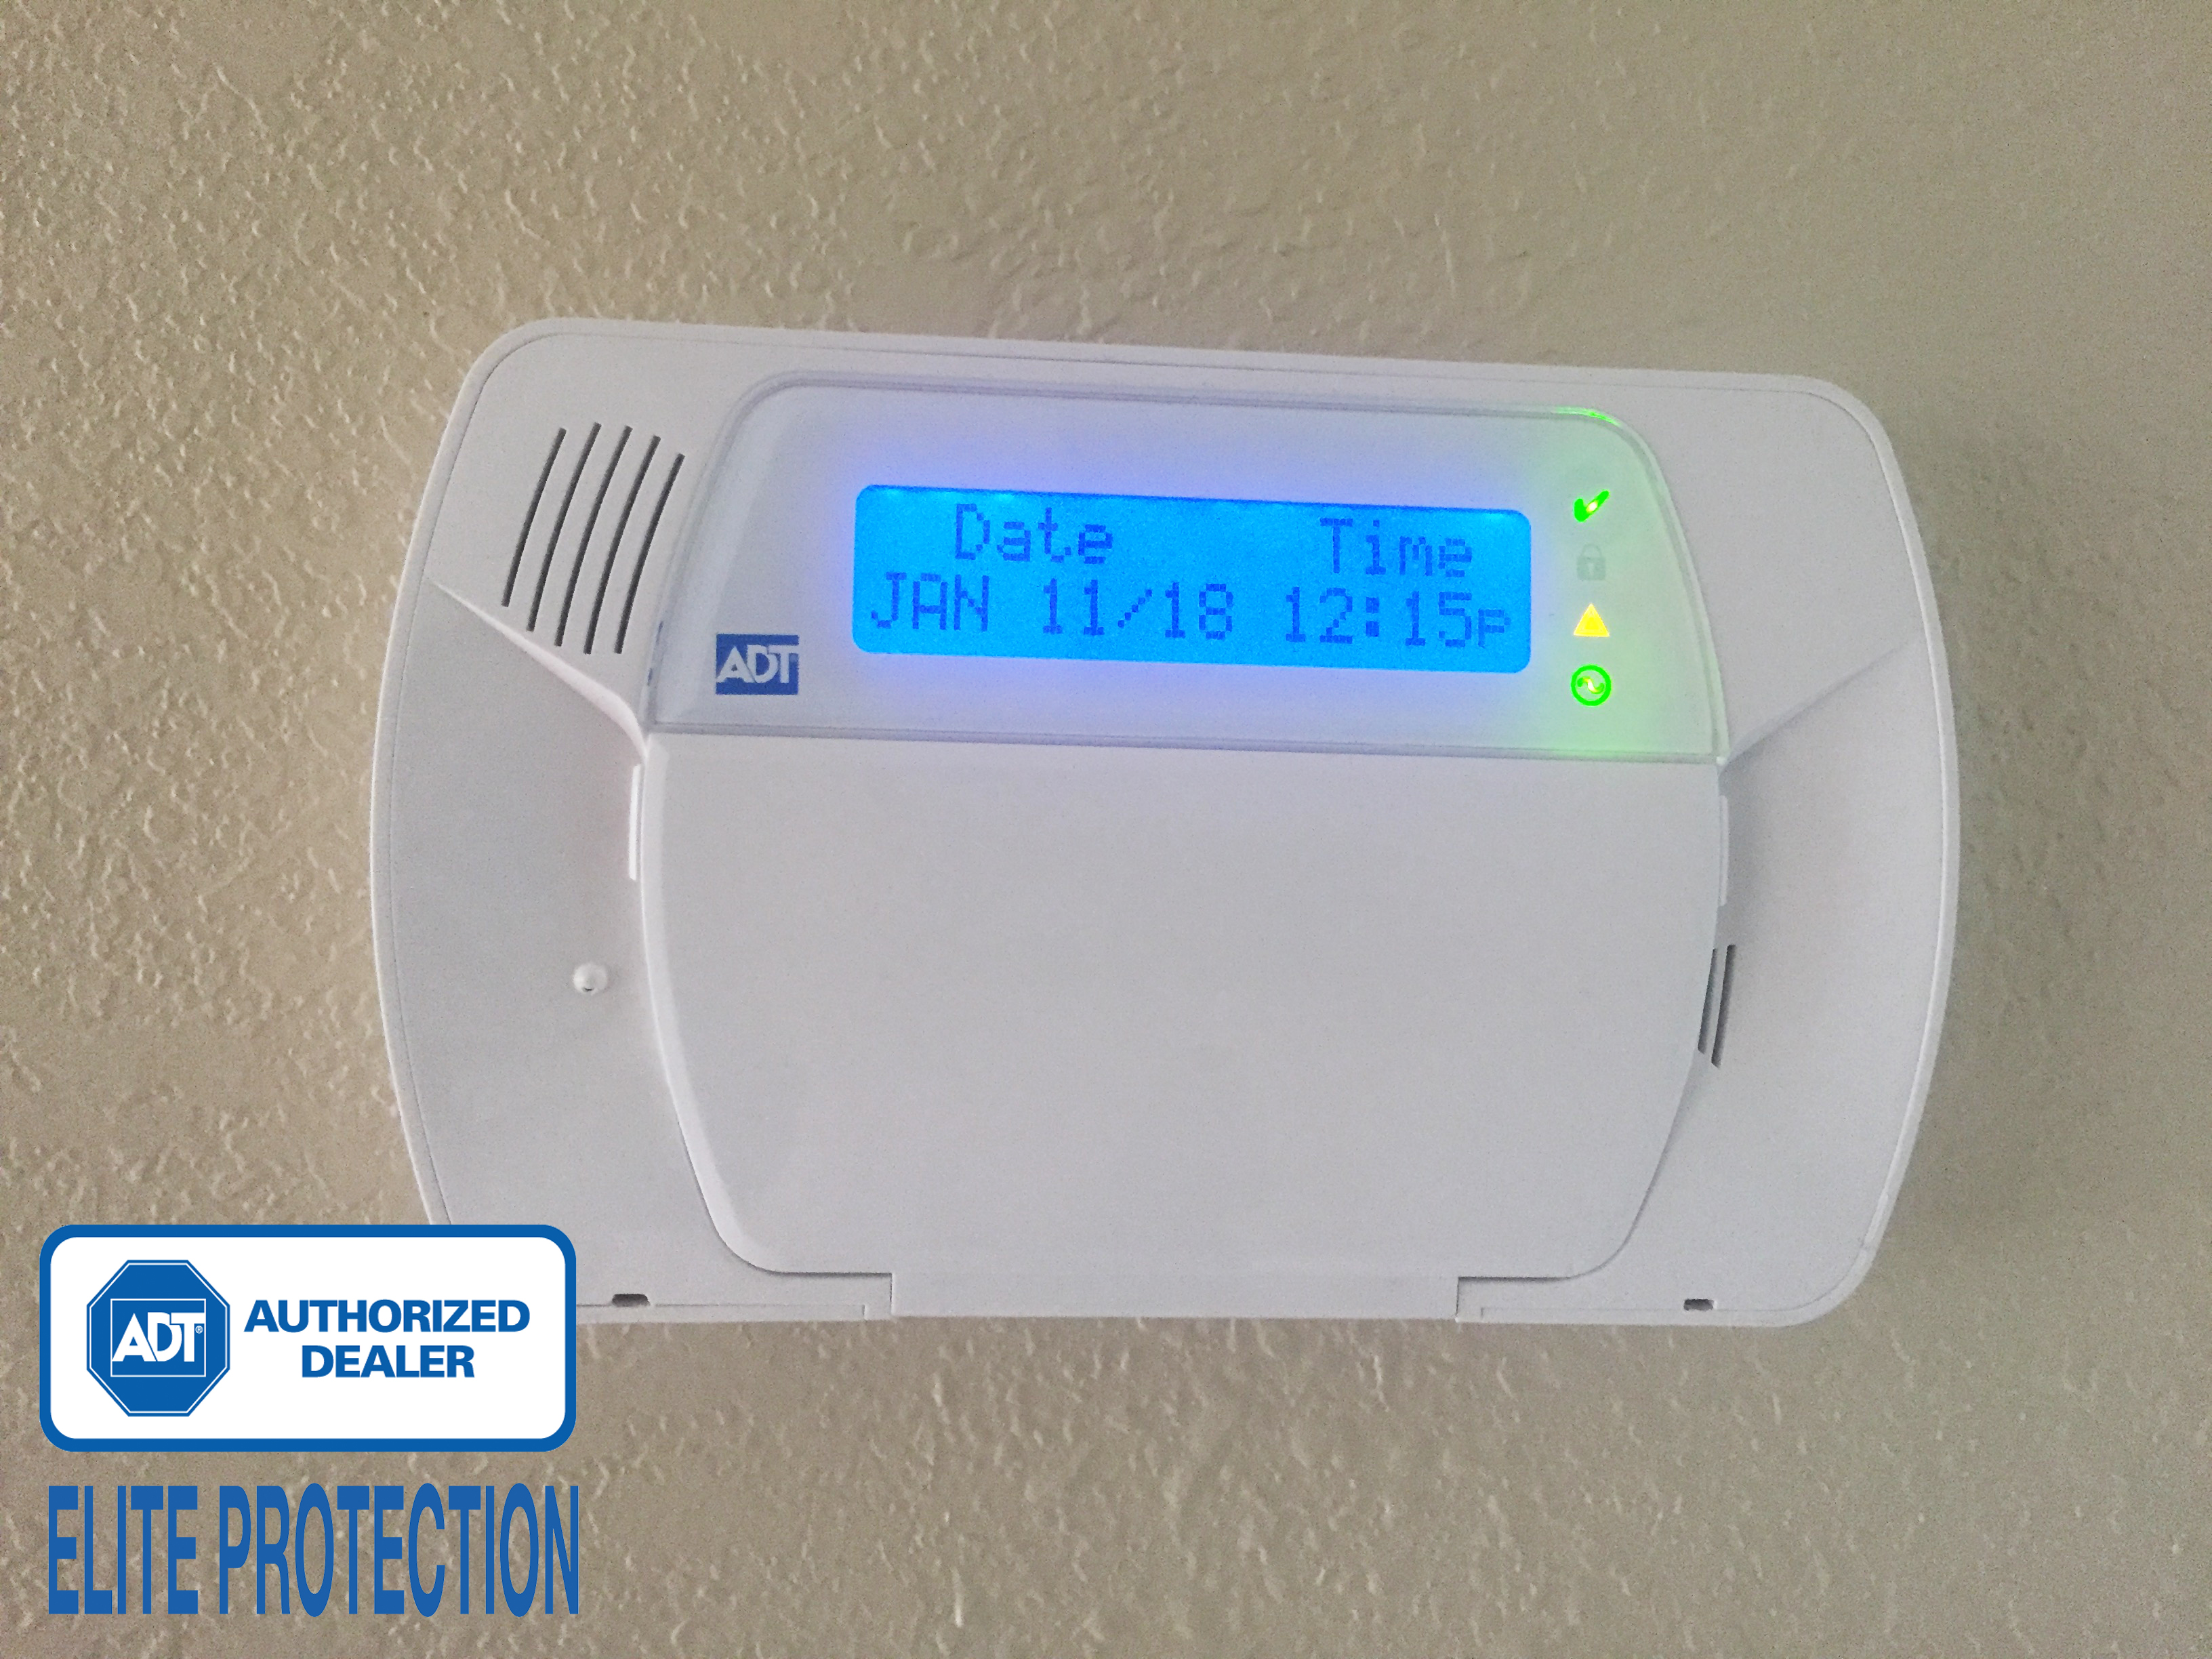 Your Dsc Pc1550 Home Security System Alarms Ubuntupogoplug Howtos